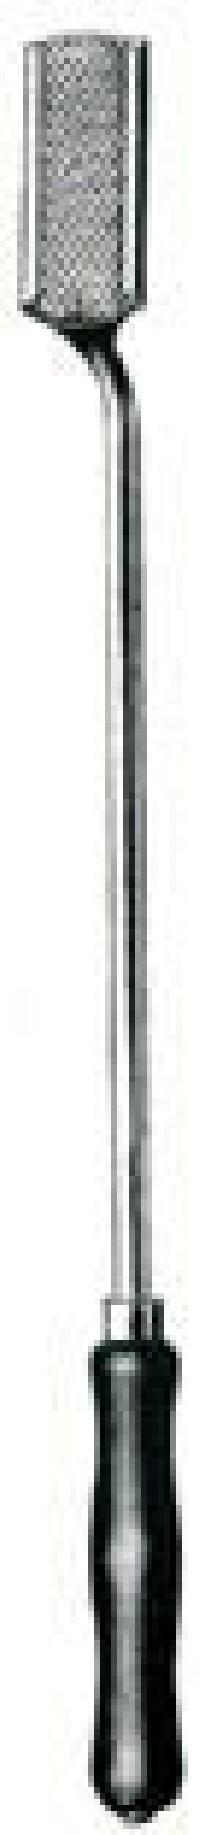 MLS-91-1804 Veterinary Tooth Instrument